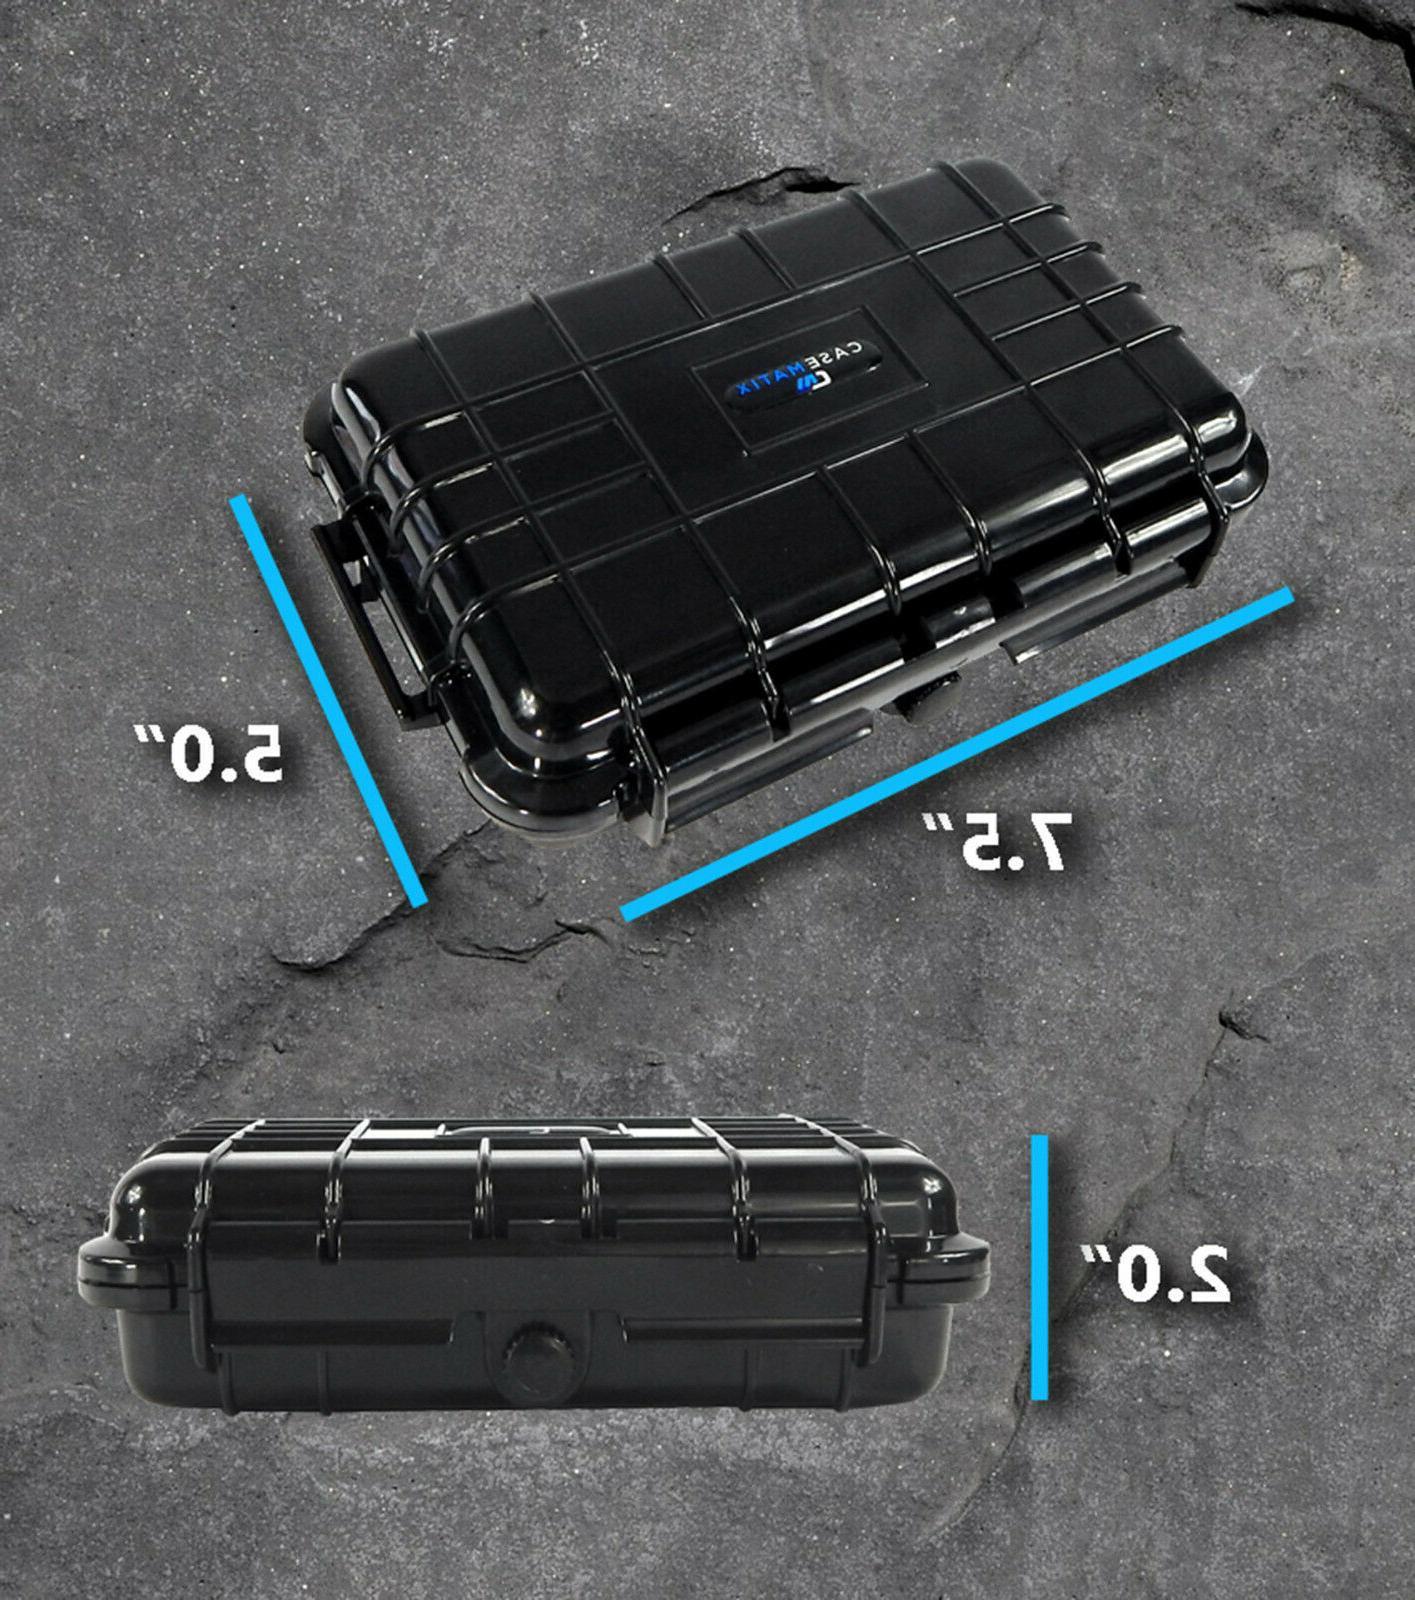 Waterproof TECH Digital Cameras Up to